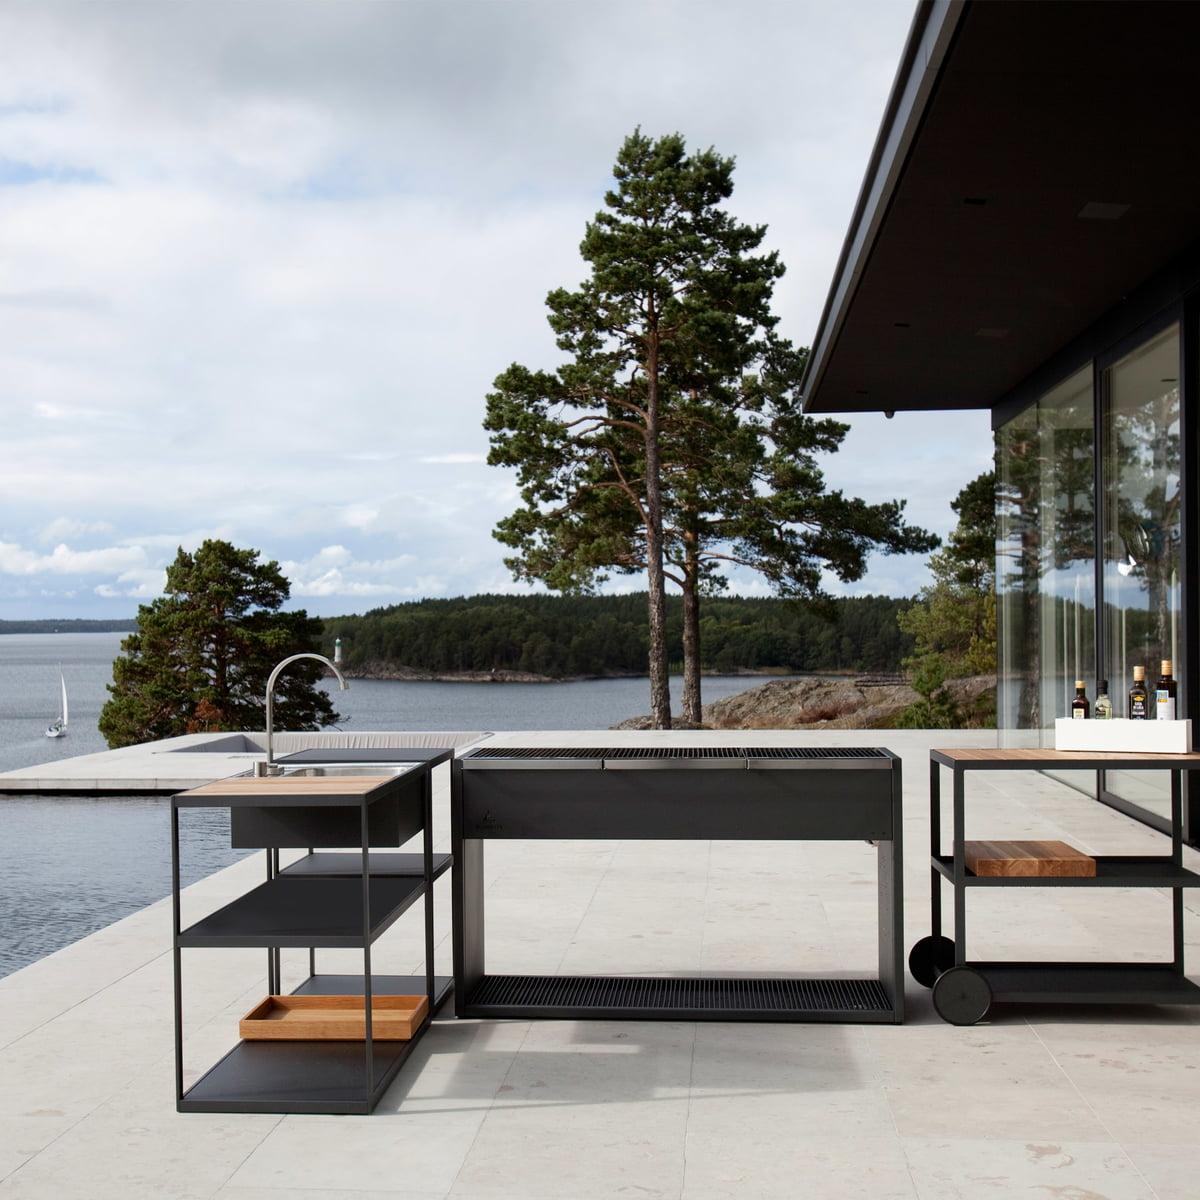 bbq grill von r shults. Black Bedroom Furniture Sets. Home Design Ideas